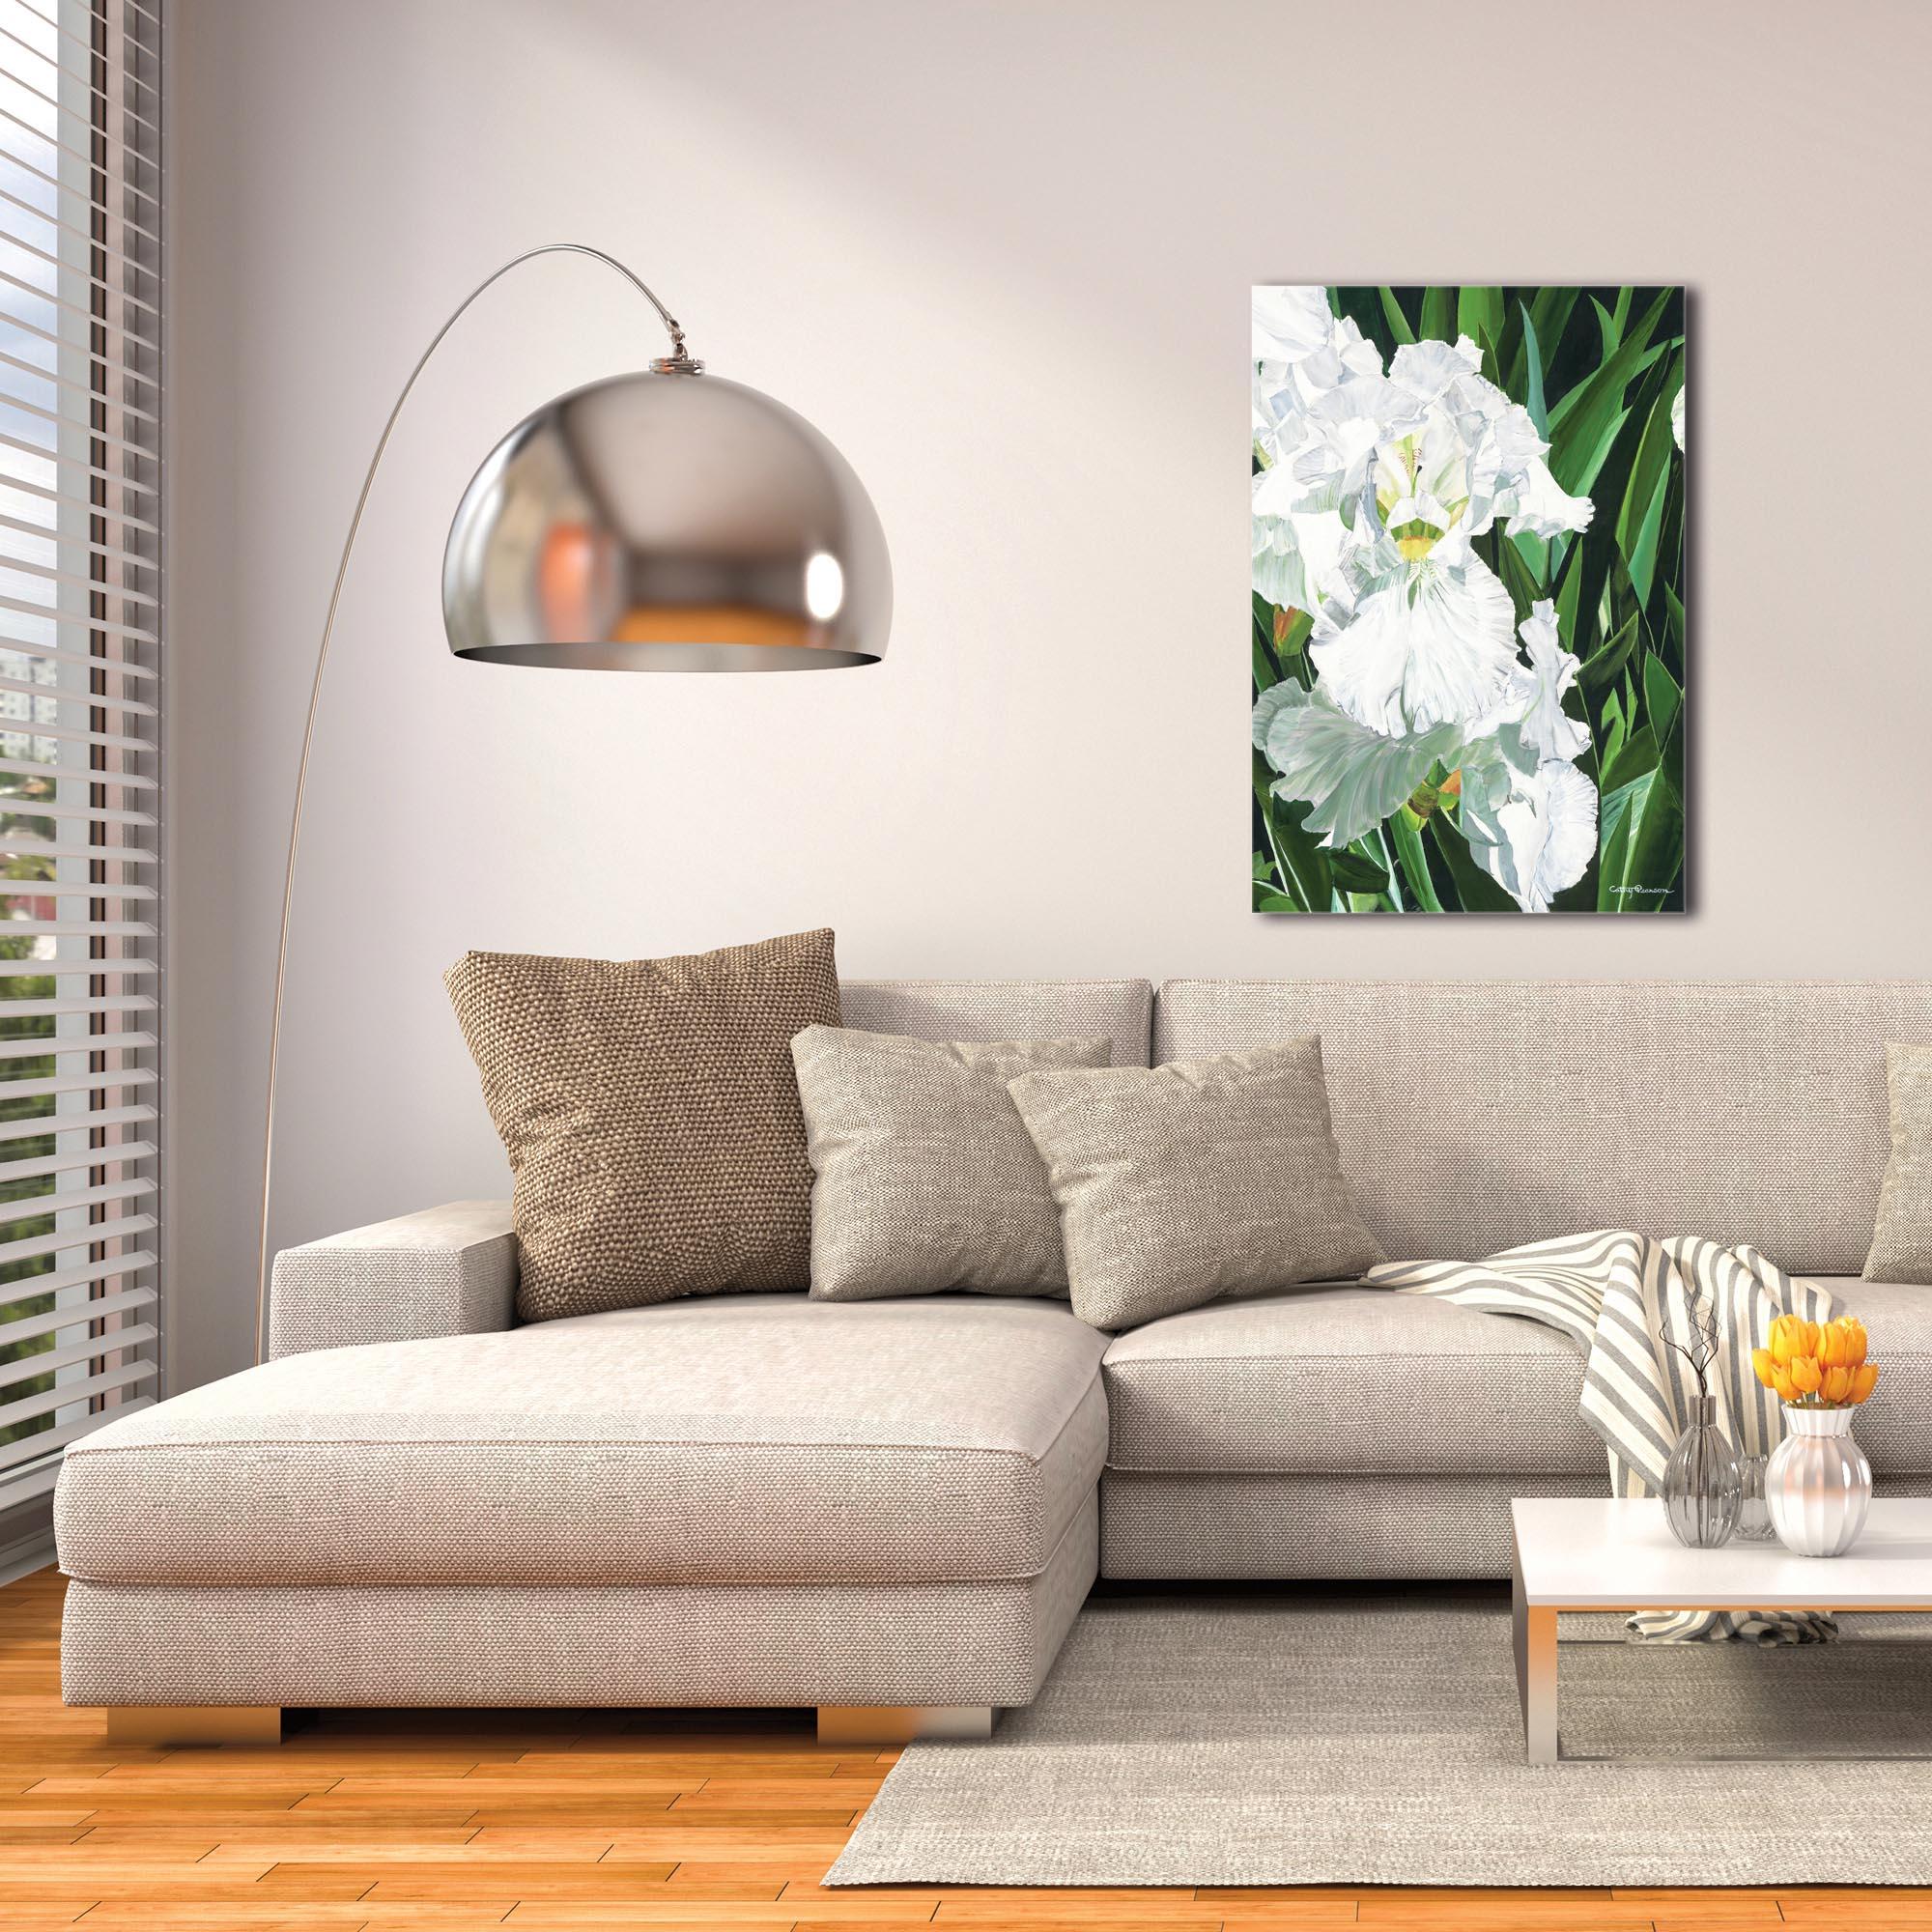 Traditional Wall Art 'Helens Iris' - Floral Decor on Metal or Plexiglass - Image 3